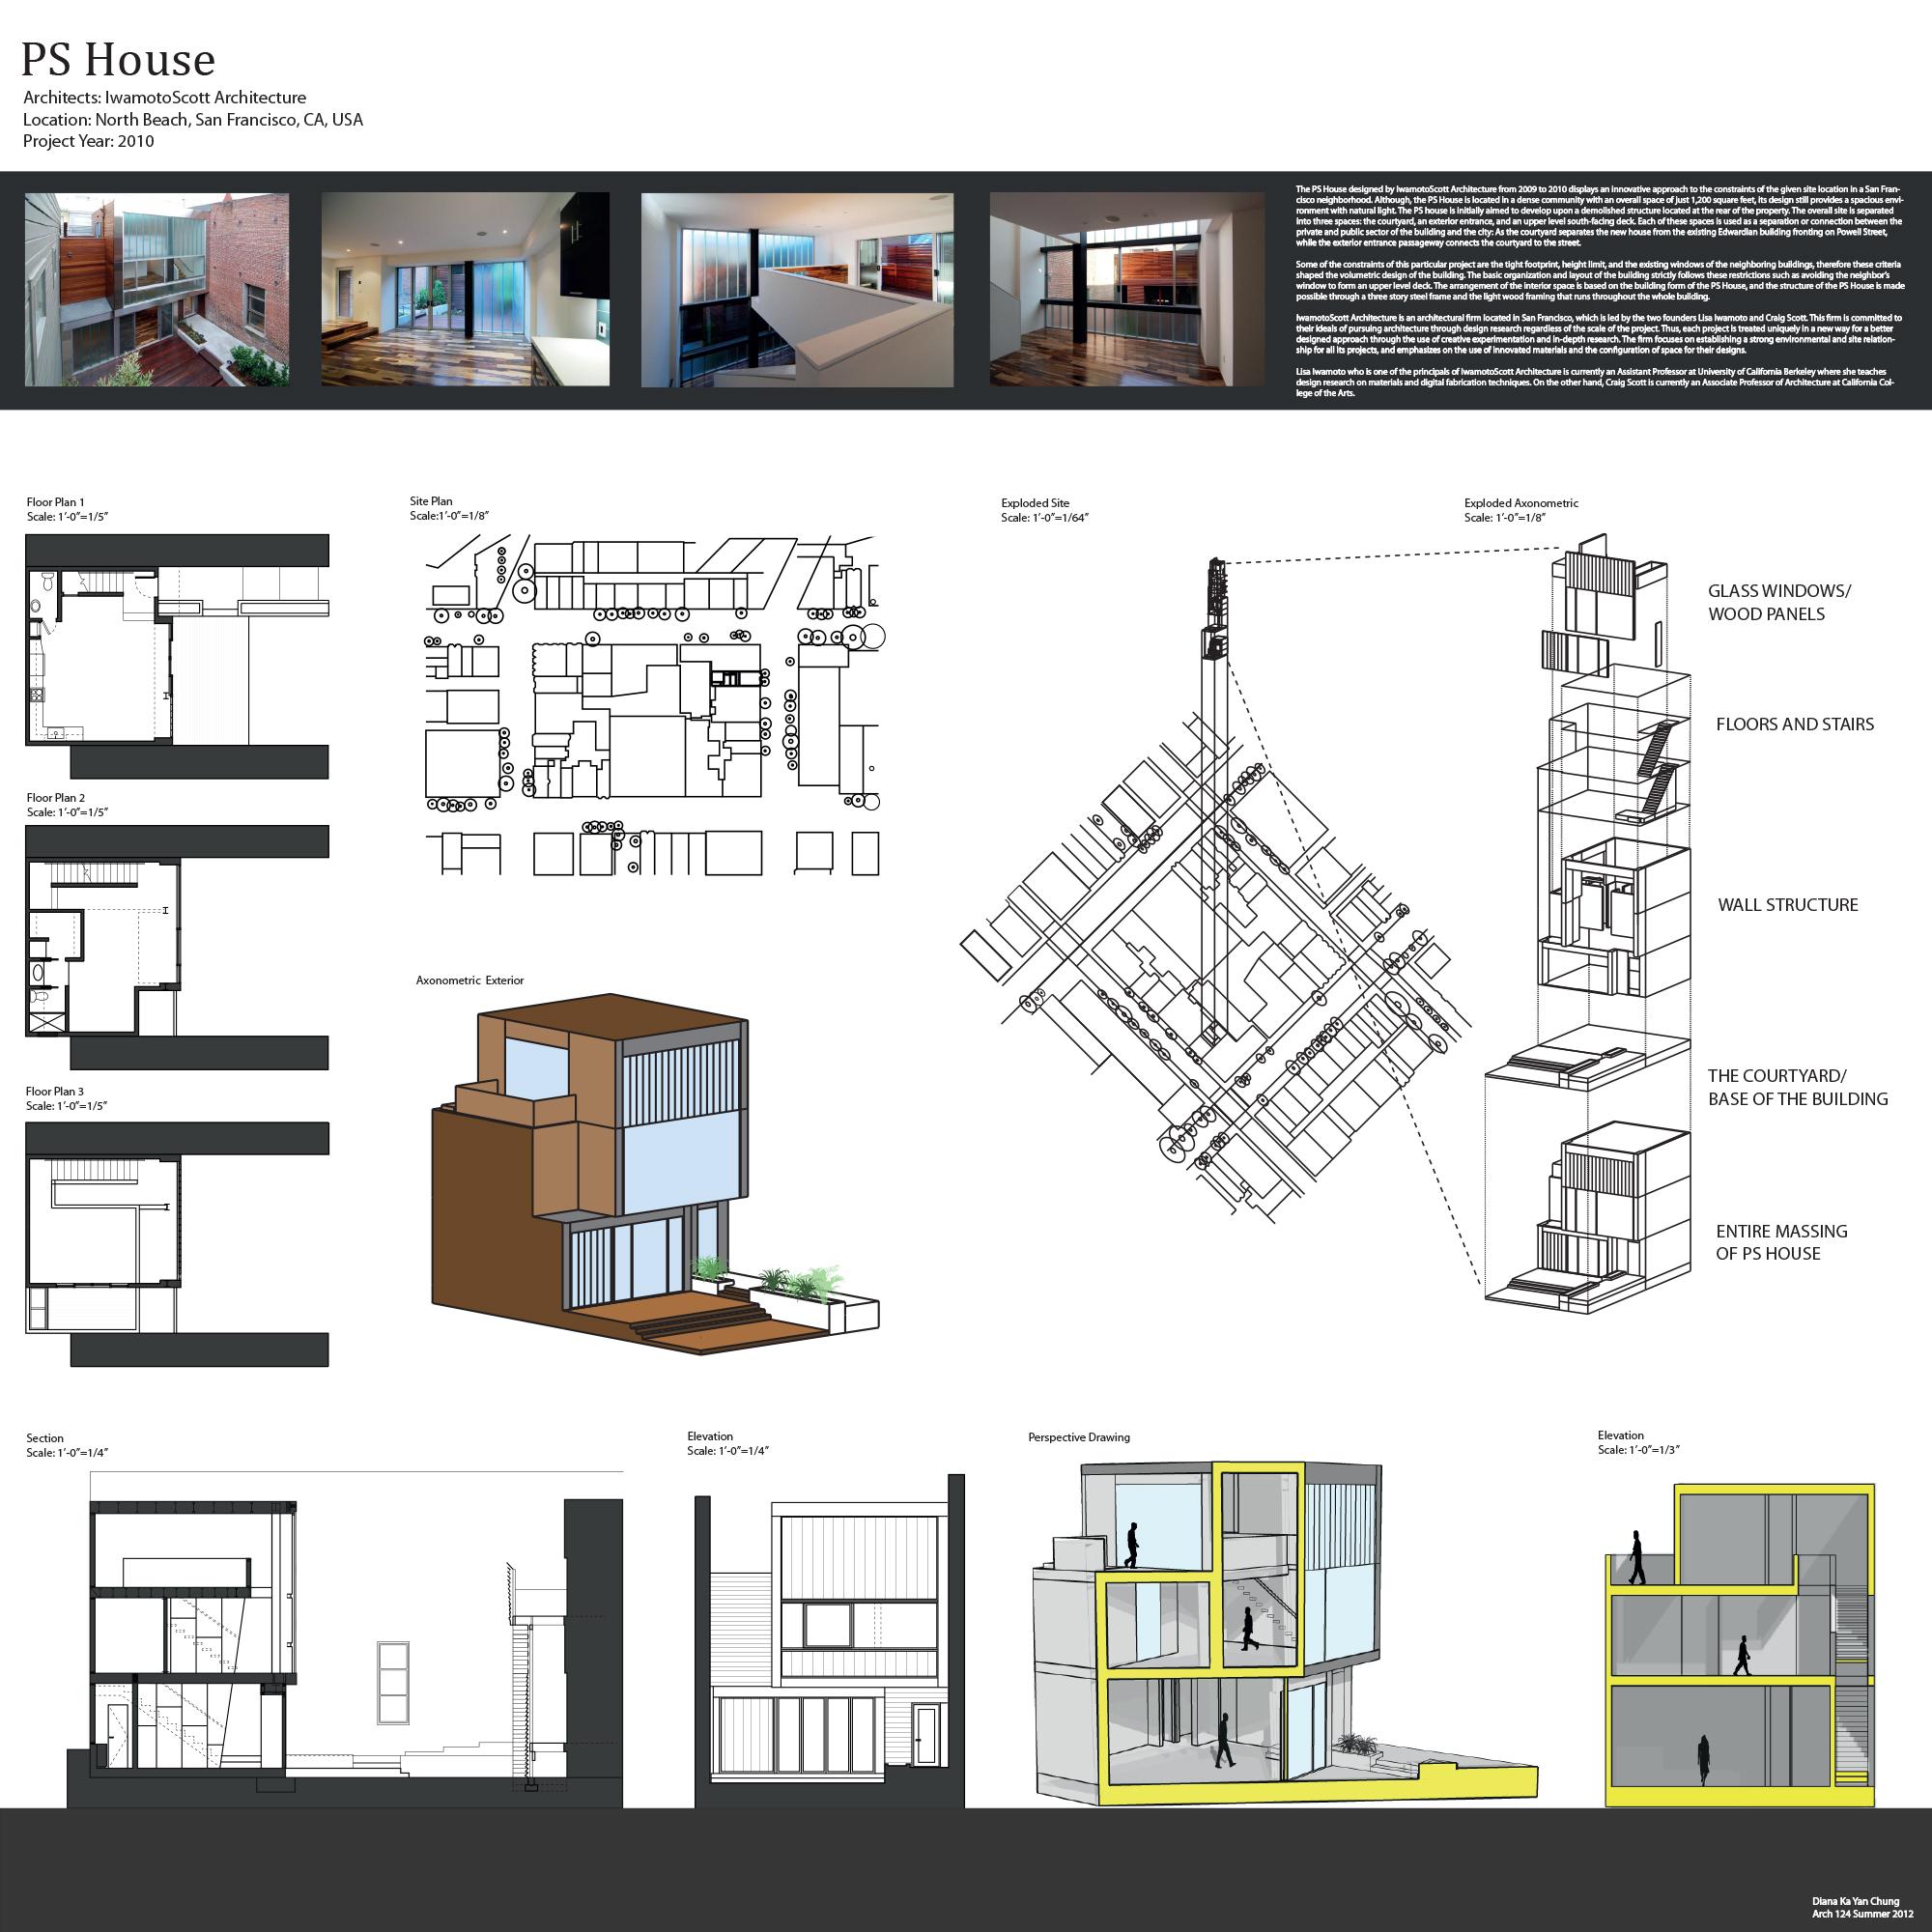 PS House, Iwamoto Scott, Diana Chung, Arch 124A, UC Berkeley